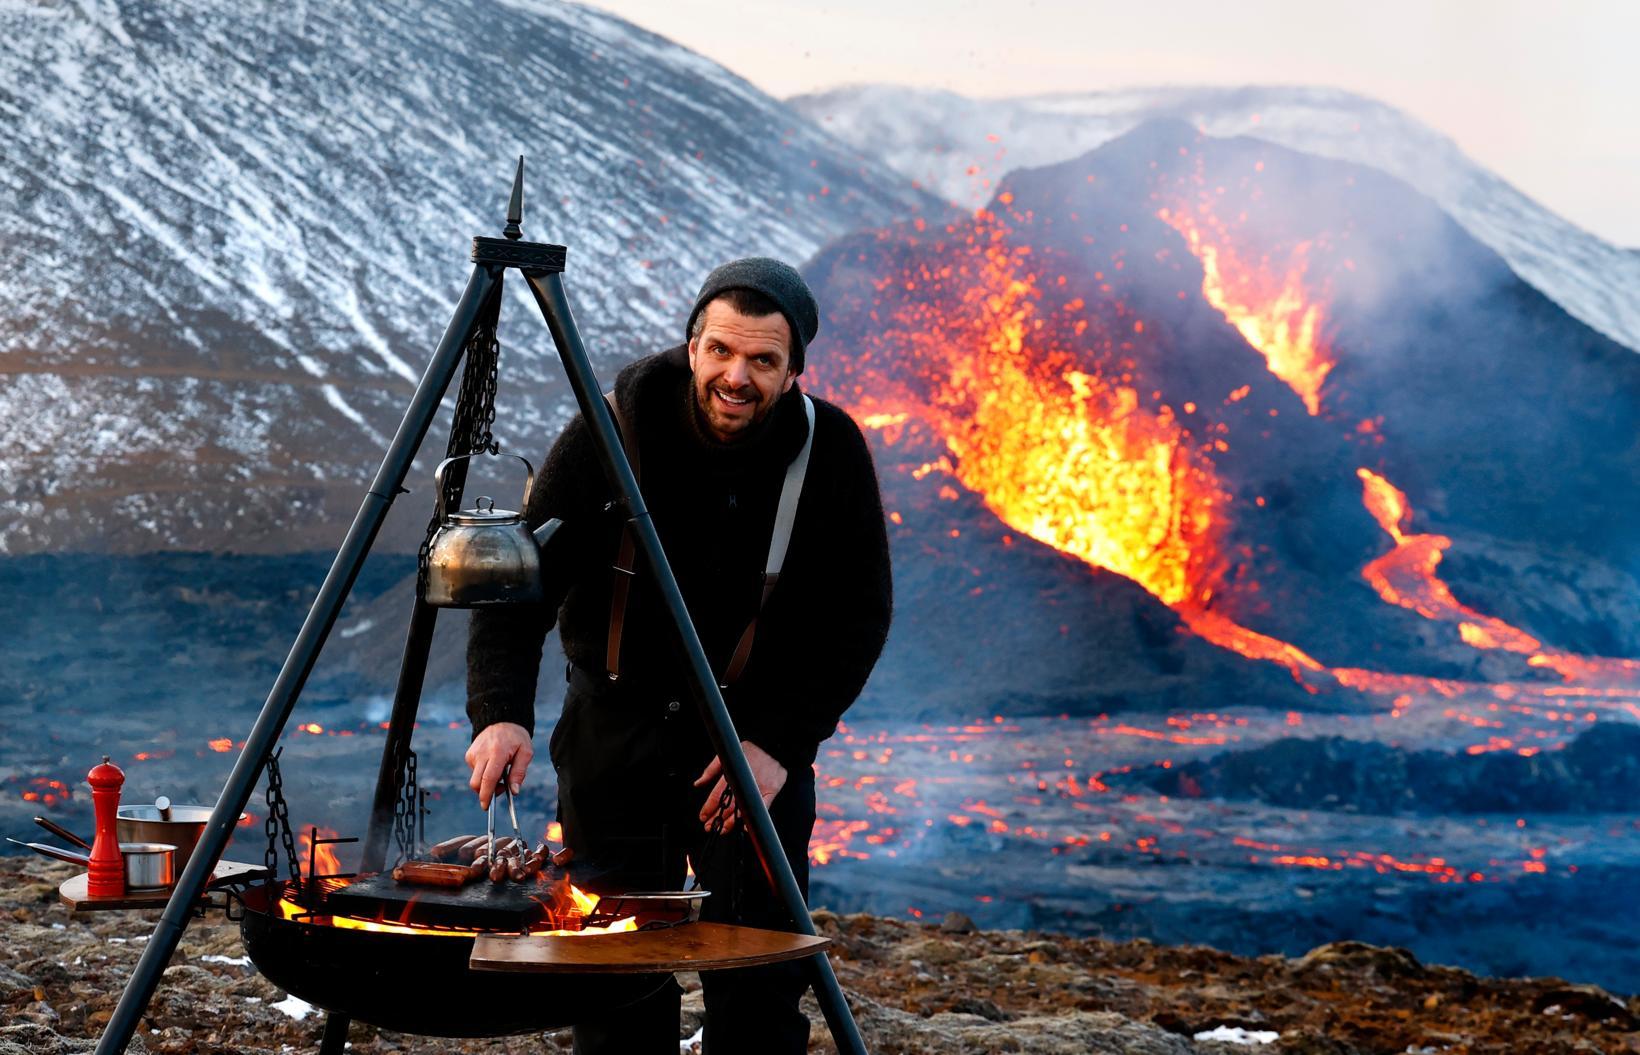 Chef Völundur Snær Völundarson demonstrates how to cook near a …